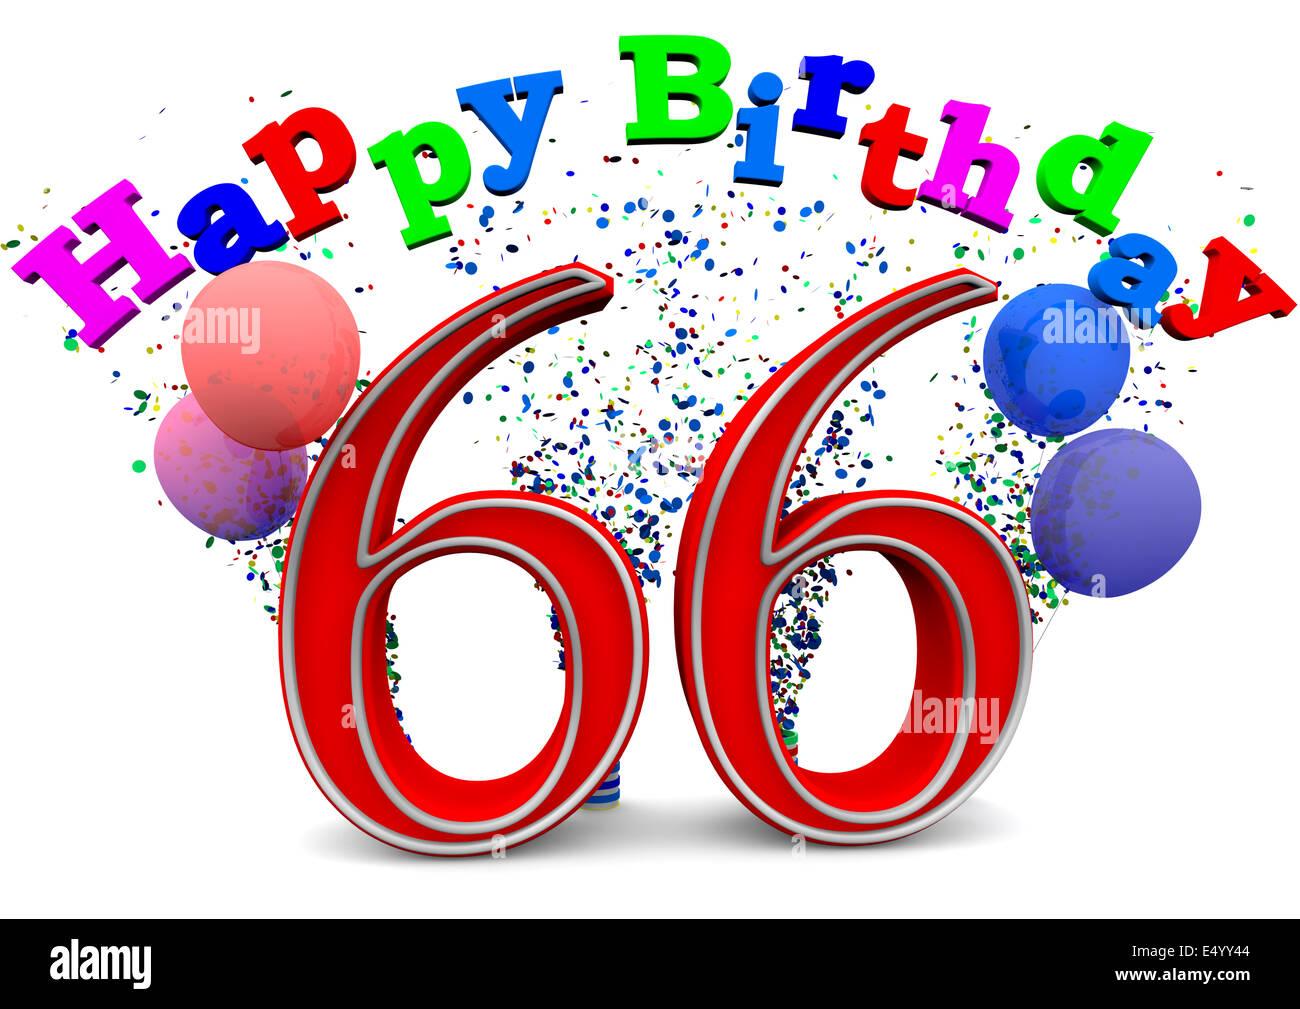 happy birthday 66 stockfotos happy birthday 66 bilder. Black Bedroom Furniture Sets. Home Design Ideas